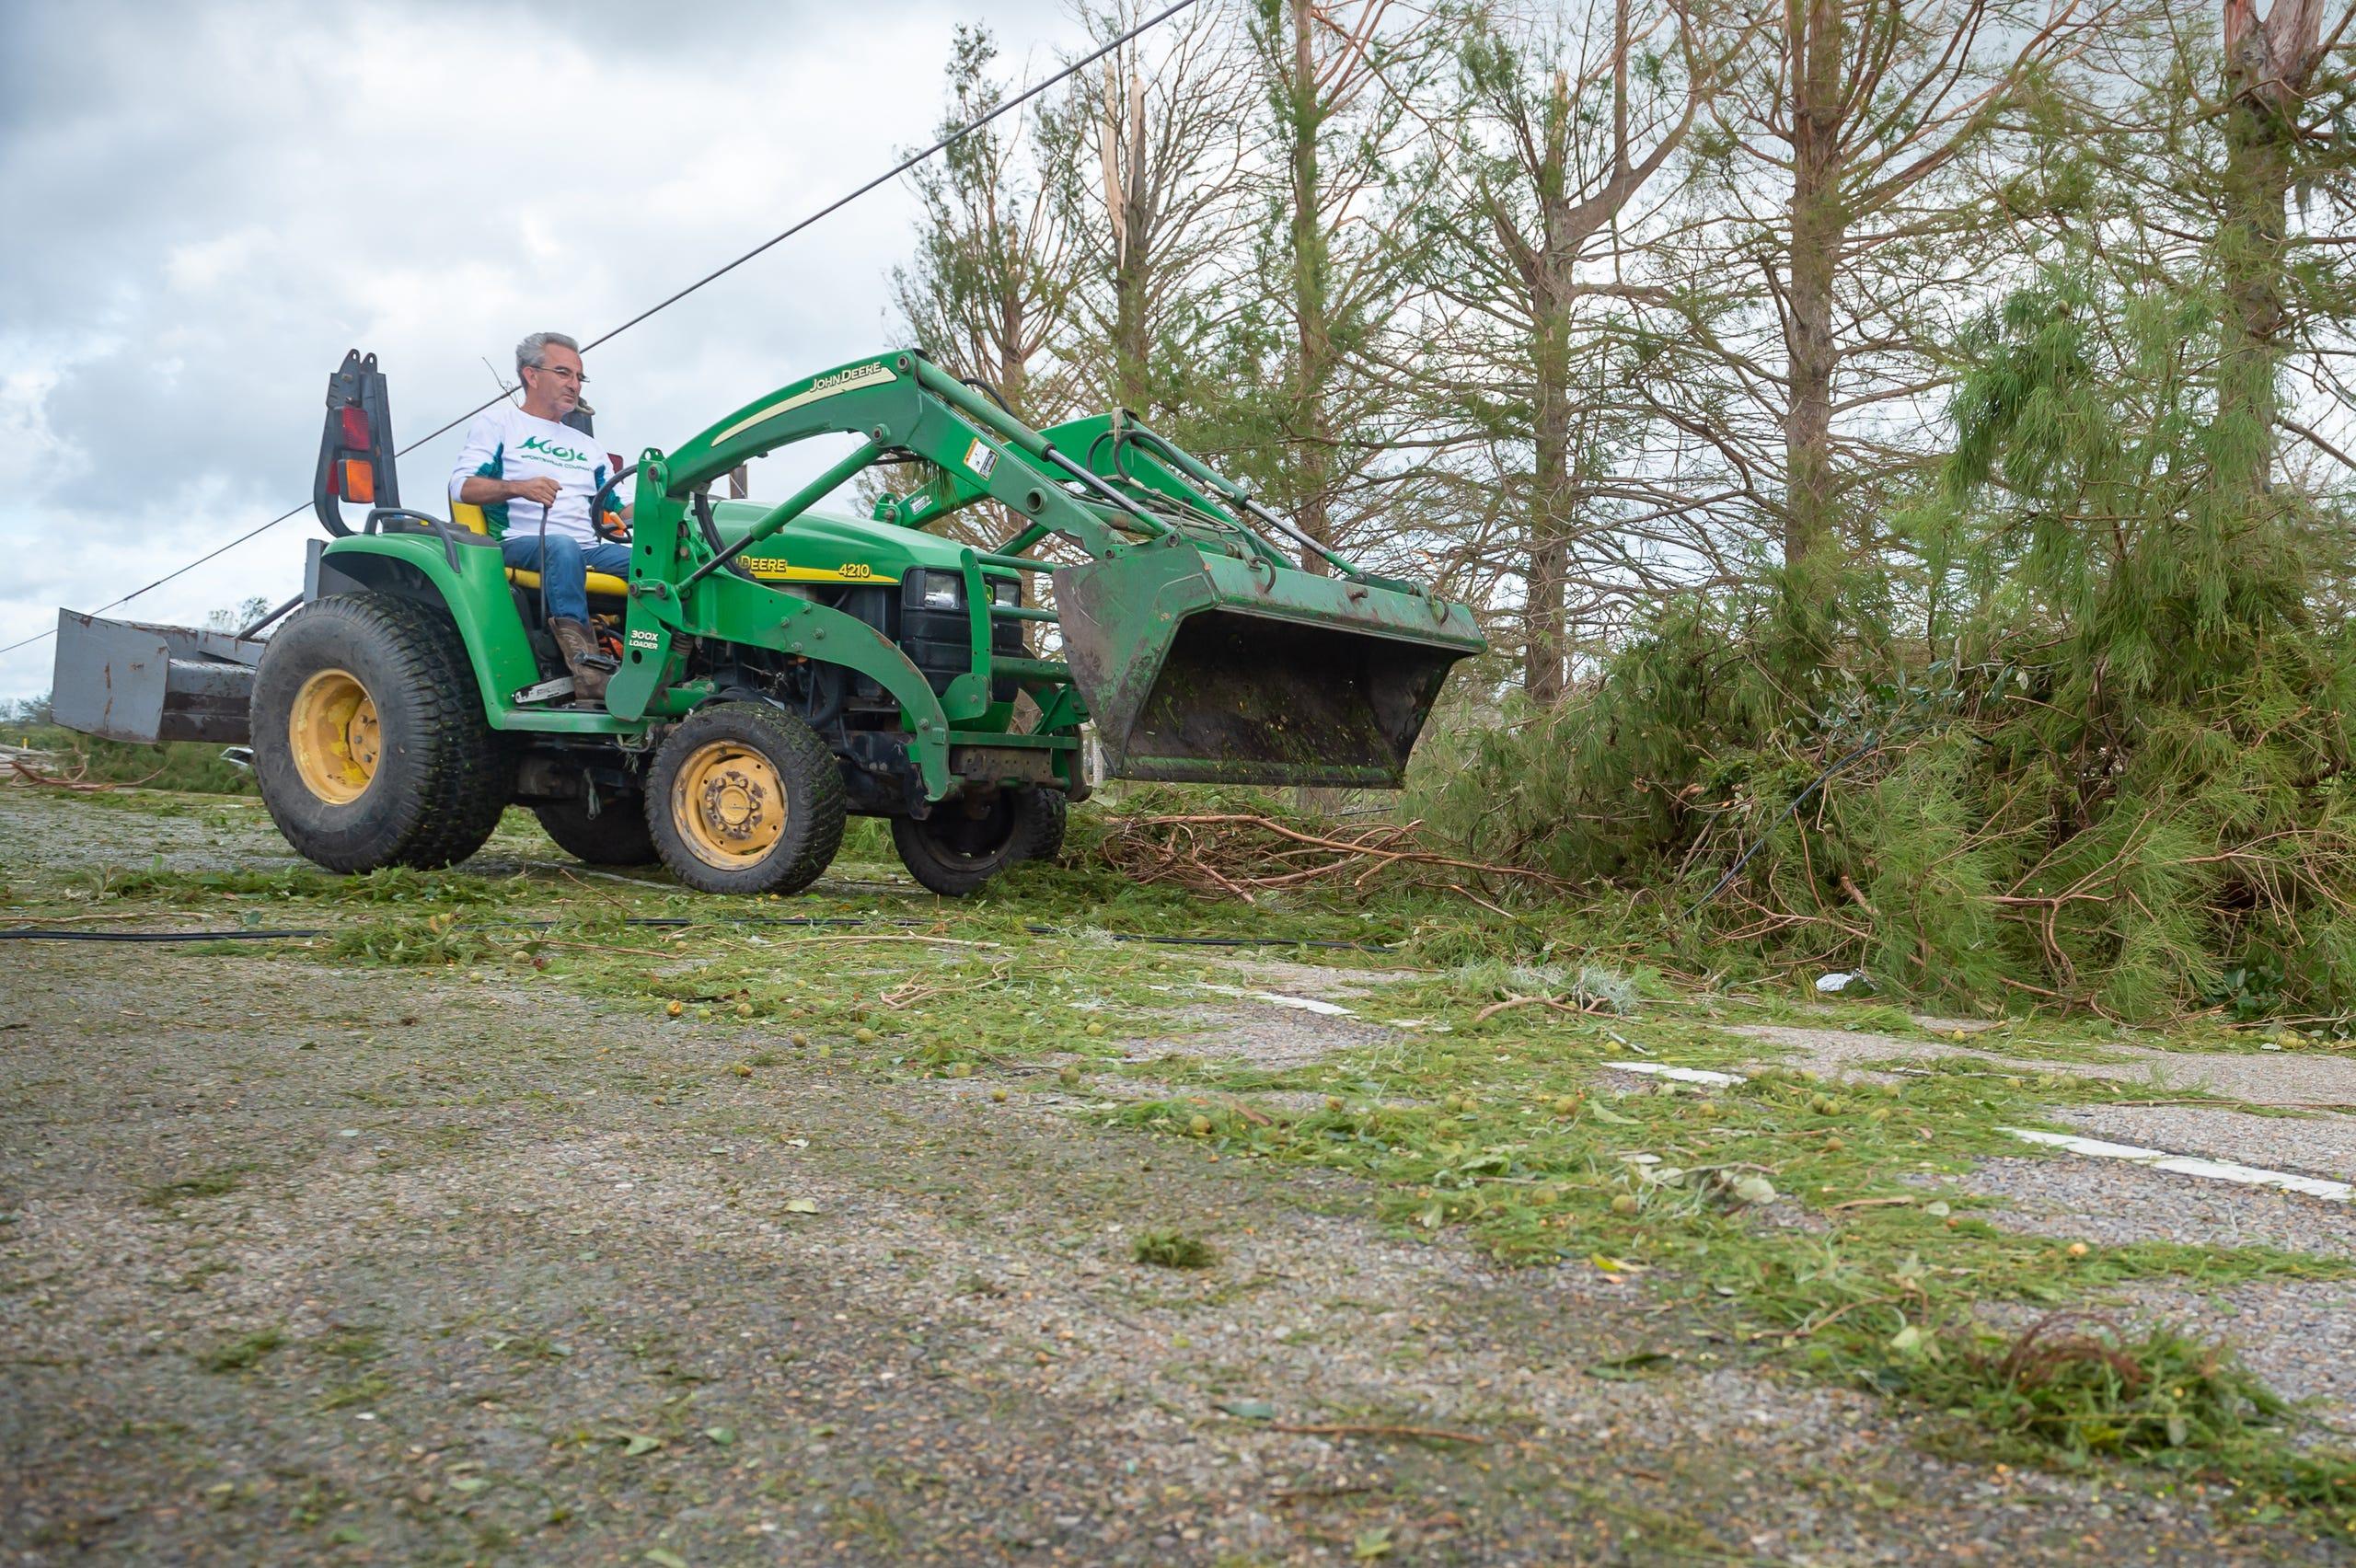 Robert Lirette clearing debris from roadway and neighbors yards after Hurricane Ida in Houma, LA. Monday, Aug. 30, 2021.